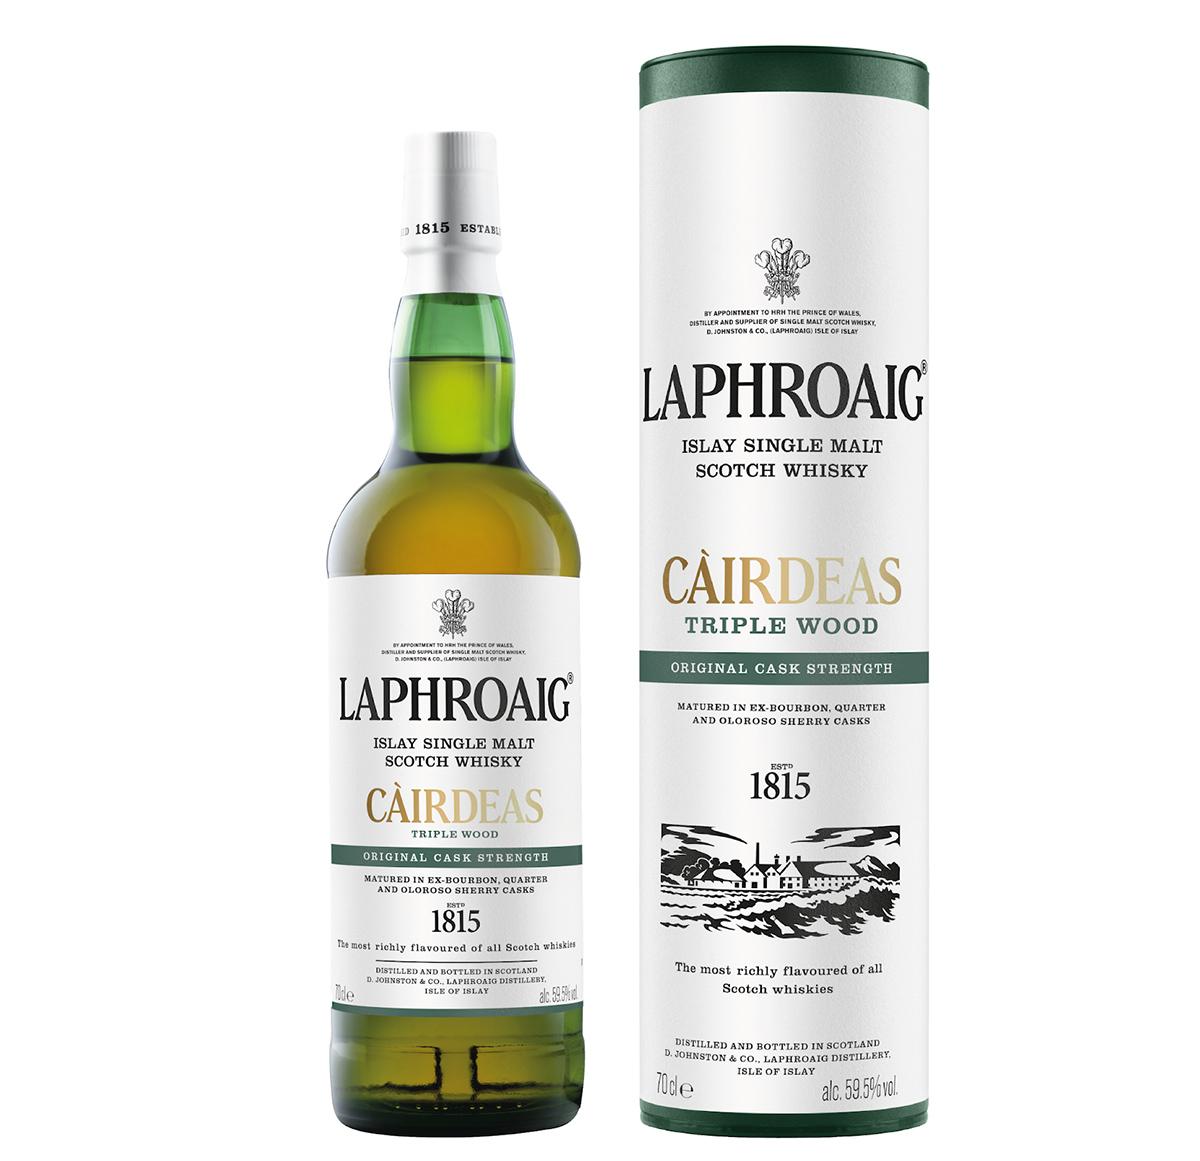 Laphroaig Cairdeas 2019